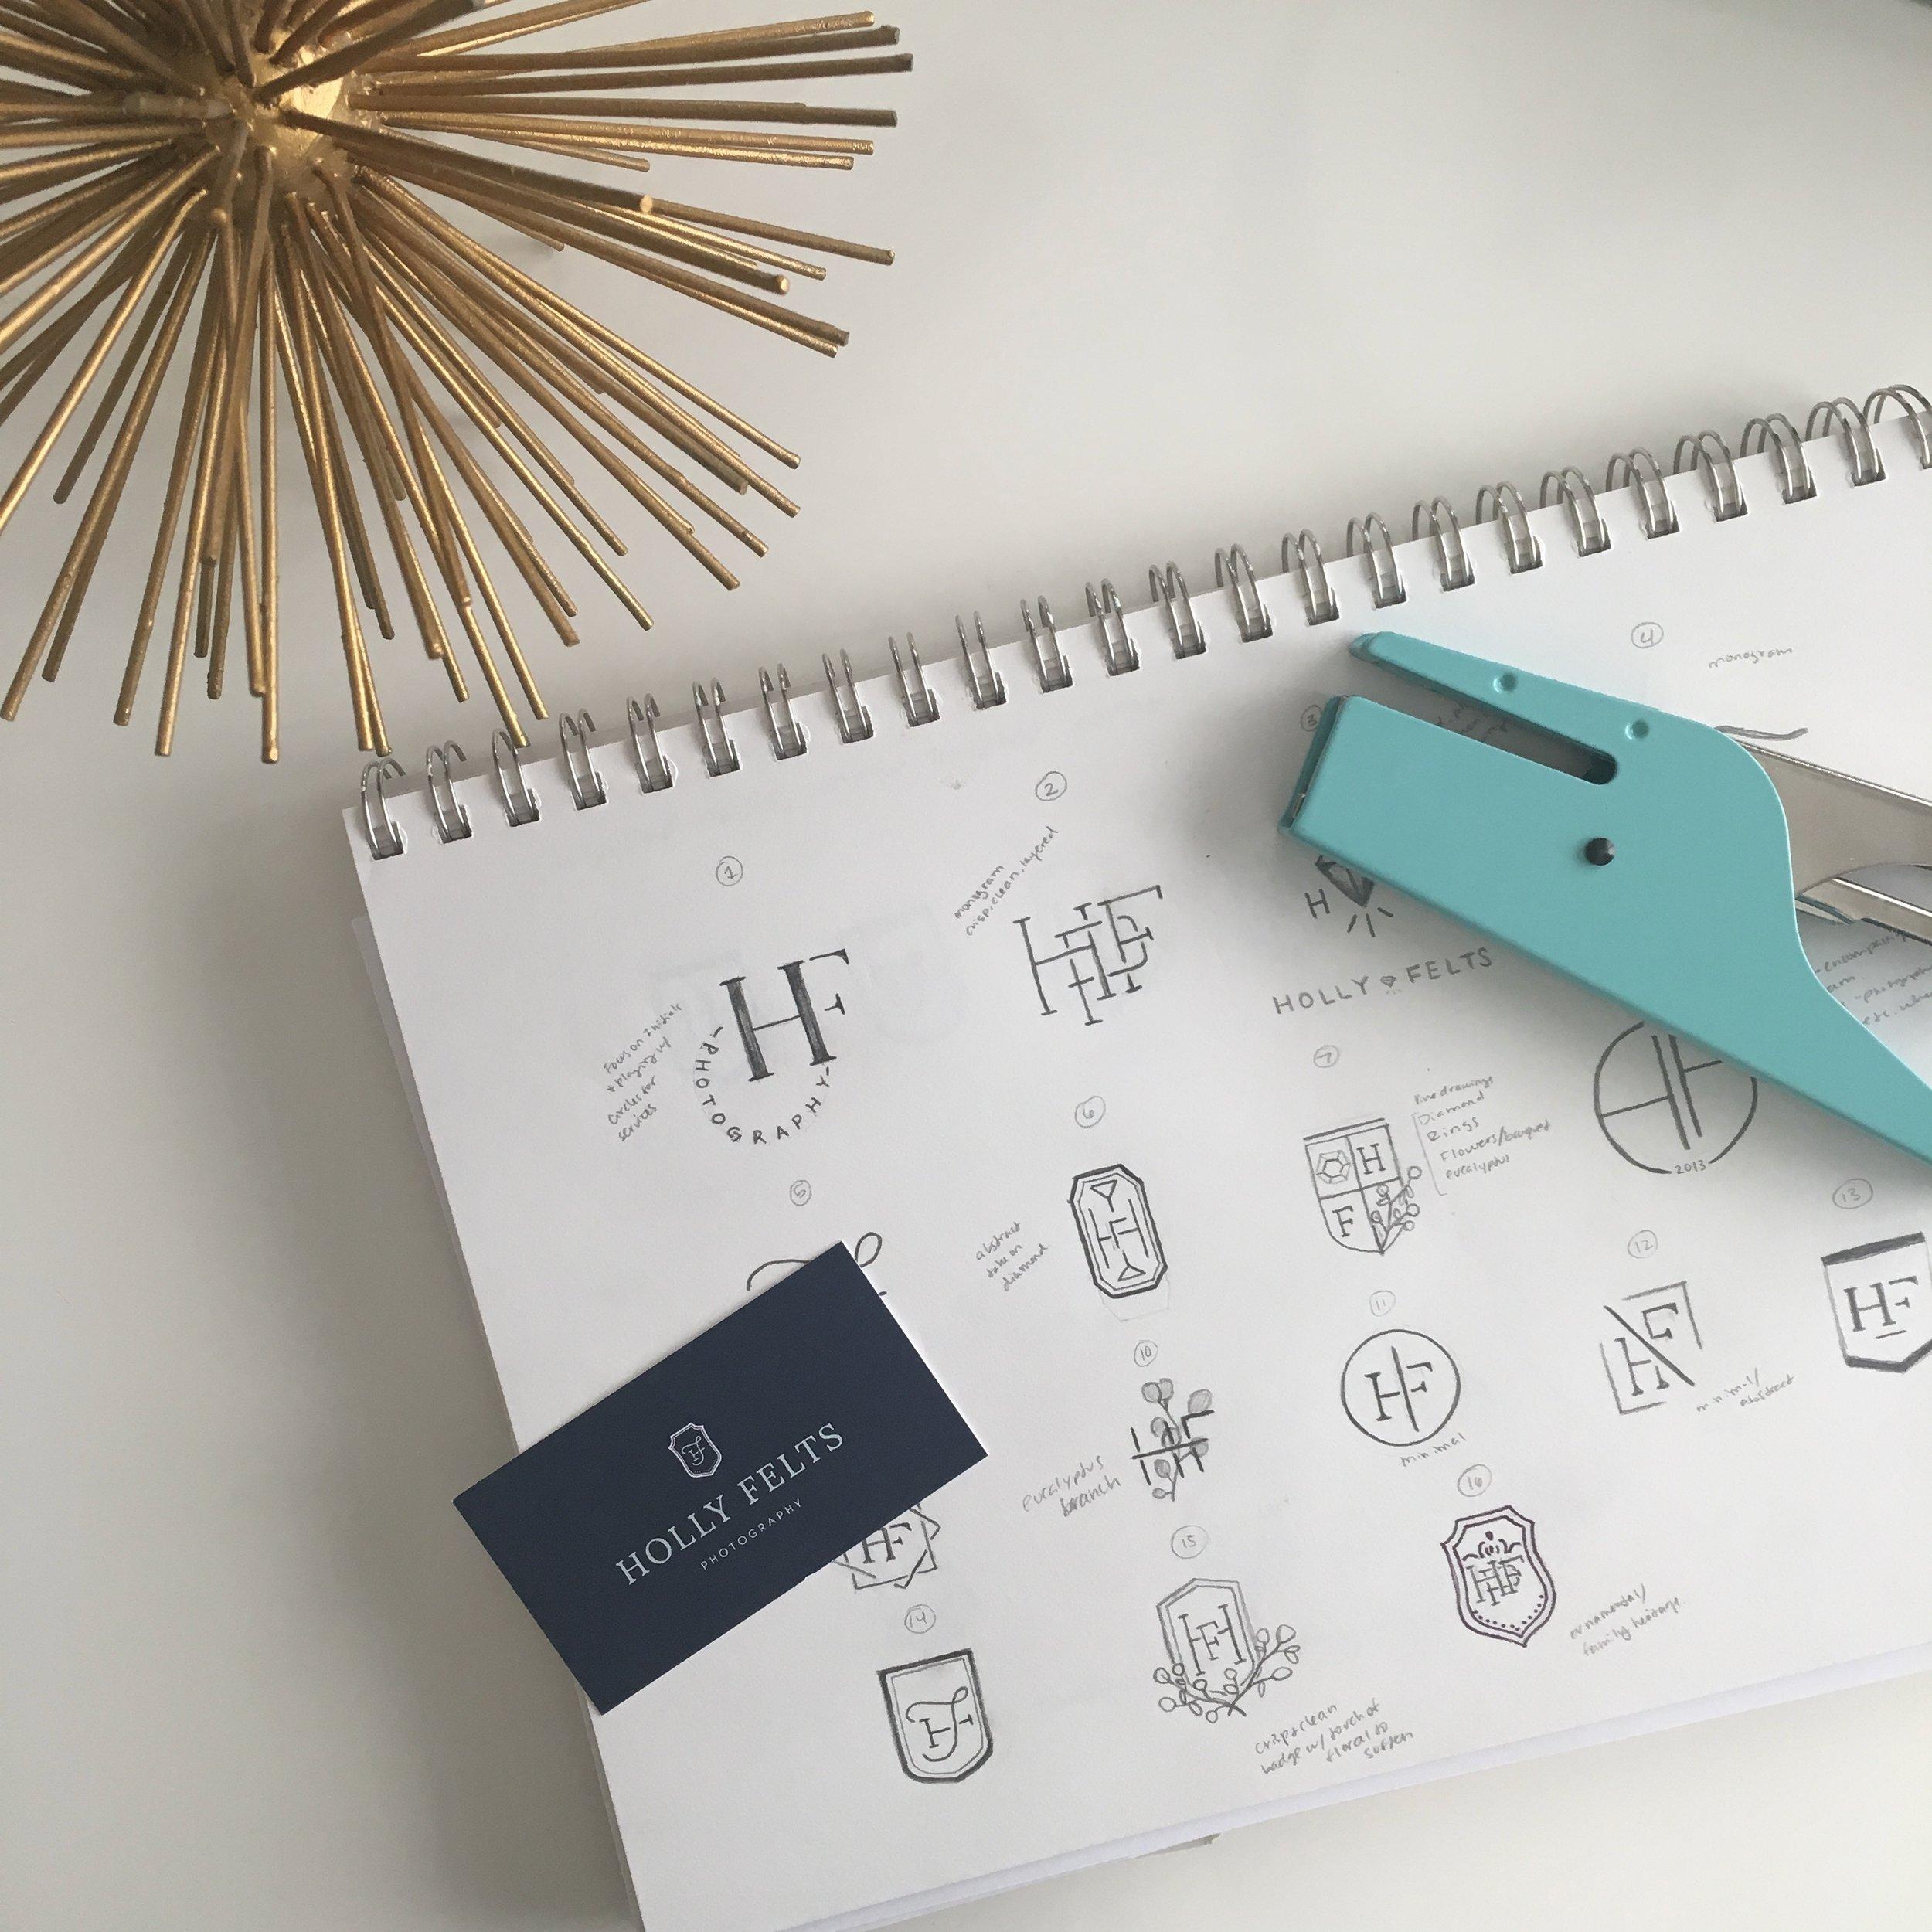 HayleyBighamDesigns-HollyFeltsPhotography-Rebrand-sketches.jpg